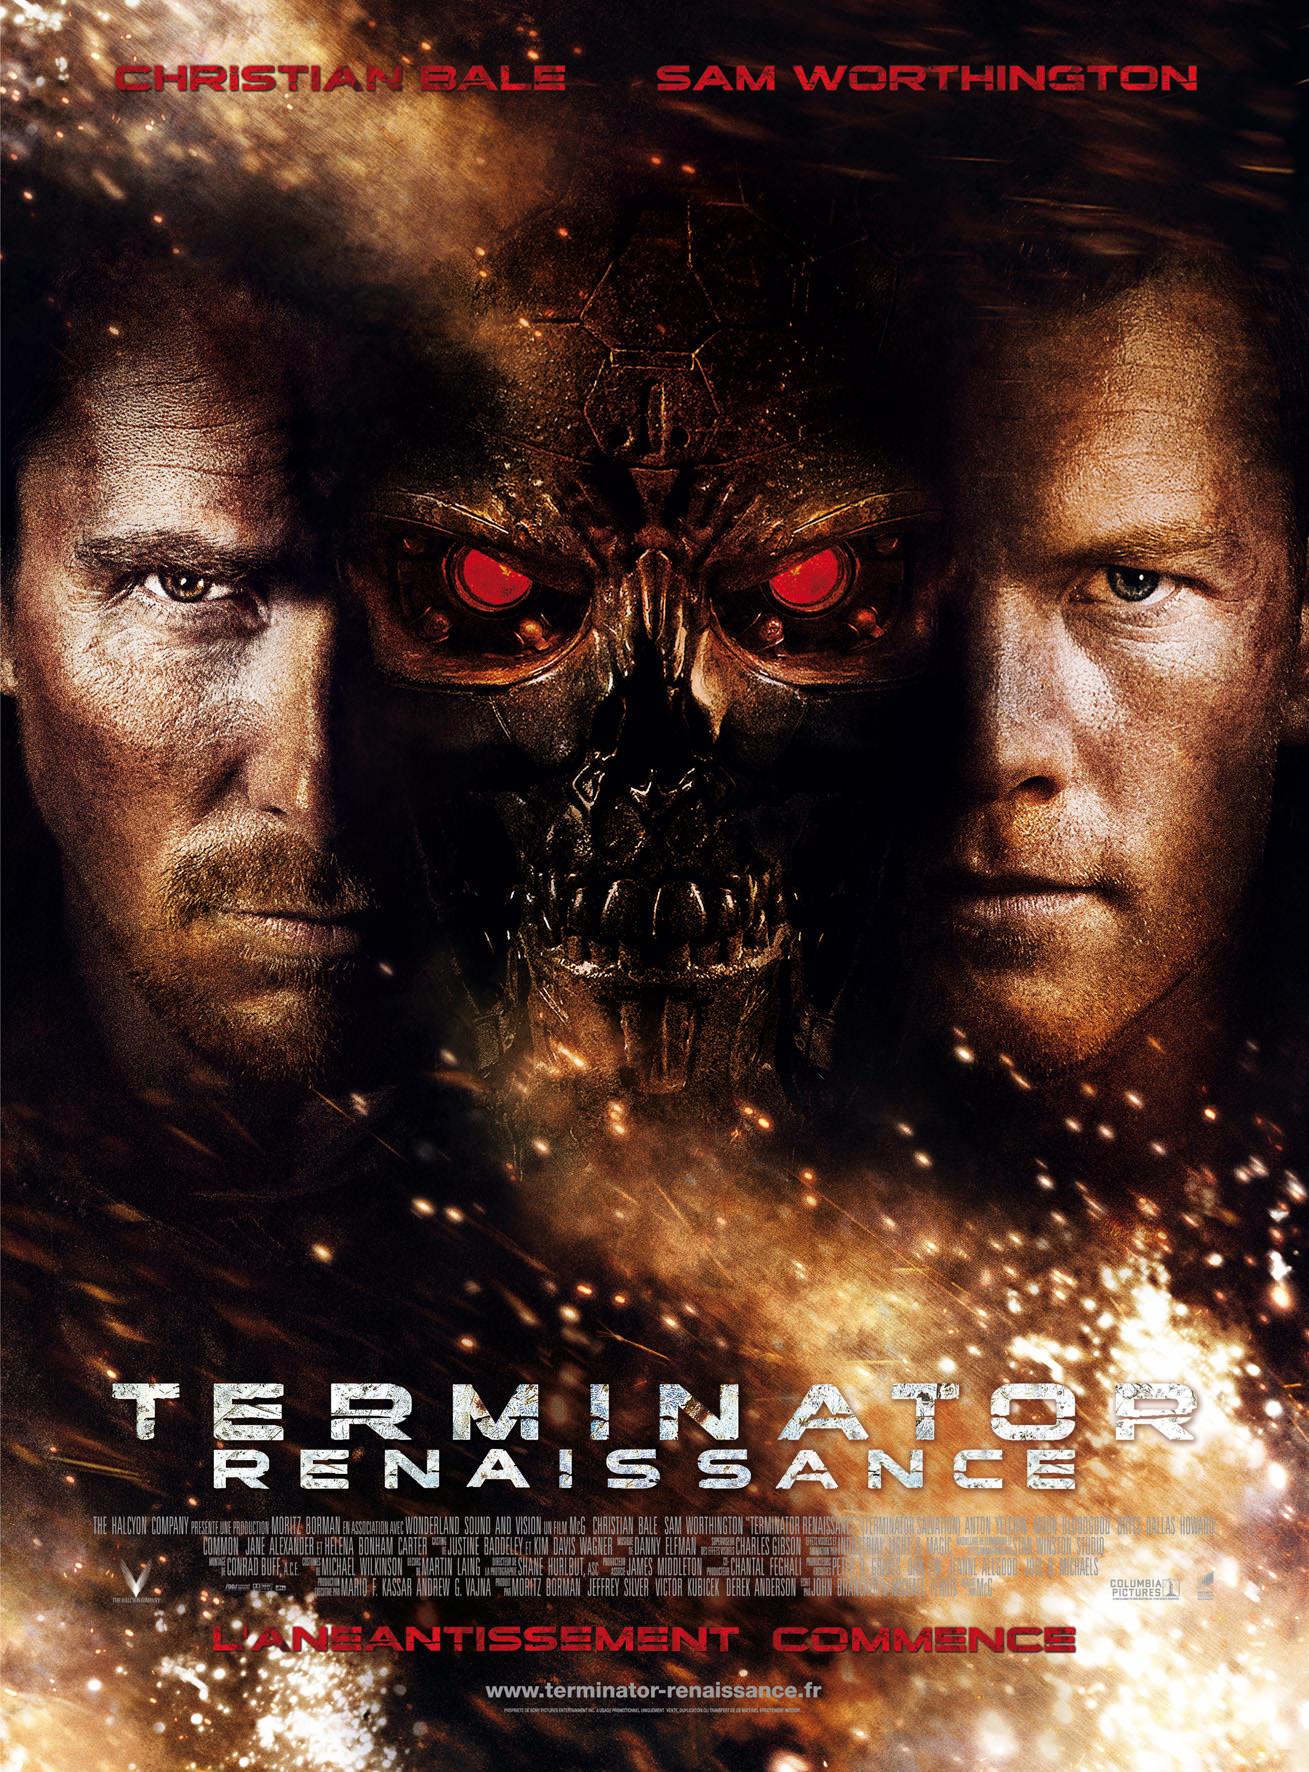 Terminator renaissance mcg